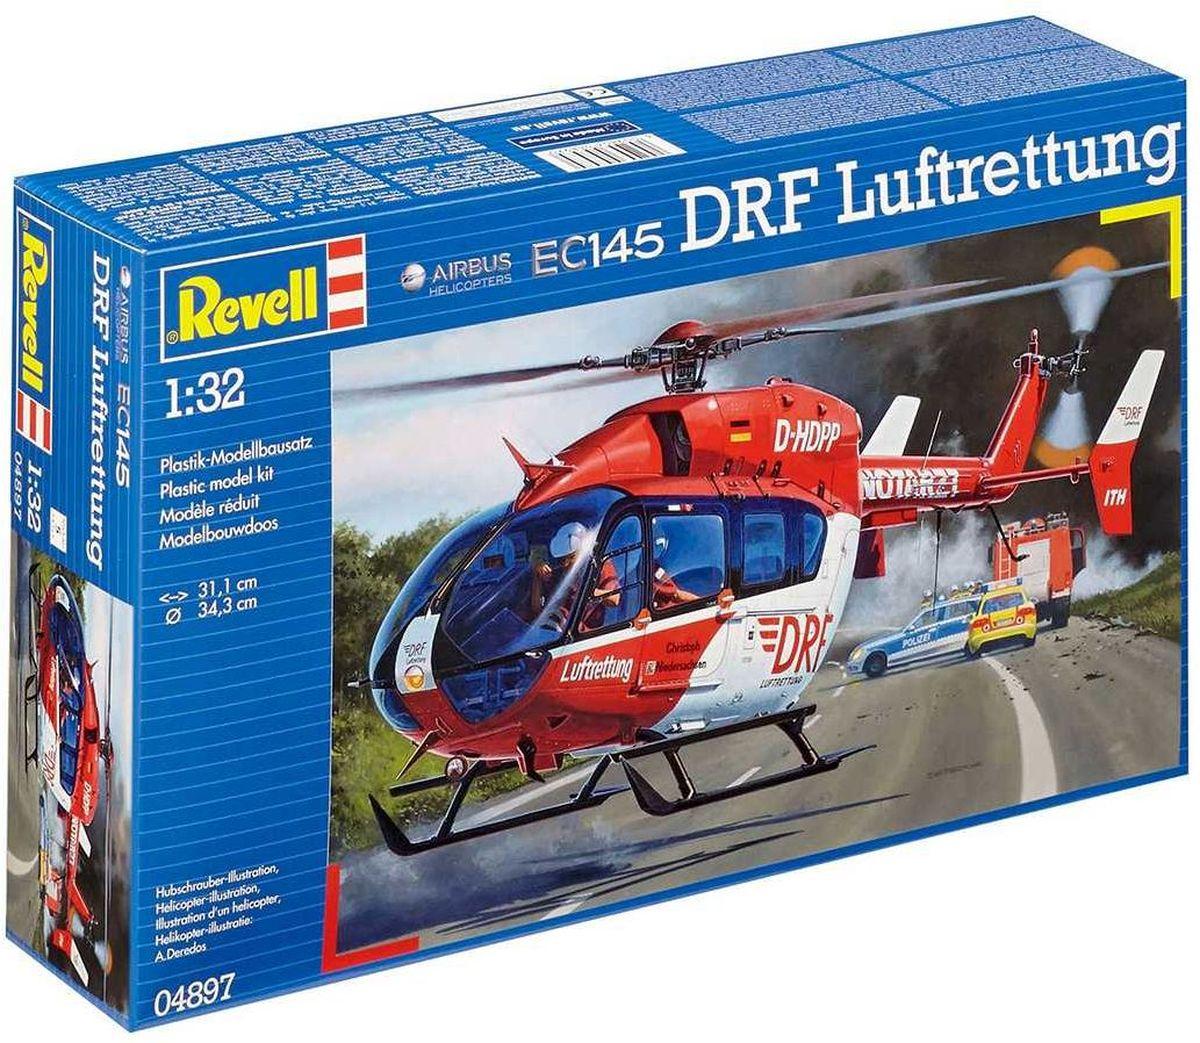 Revell Сборная модель Вертолет EC145 DRF Luftrettung